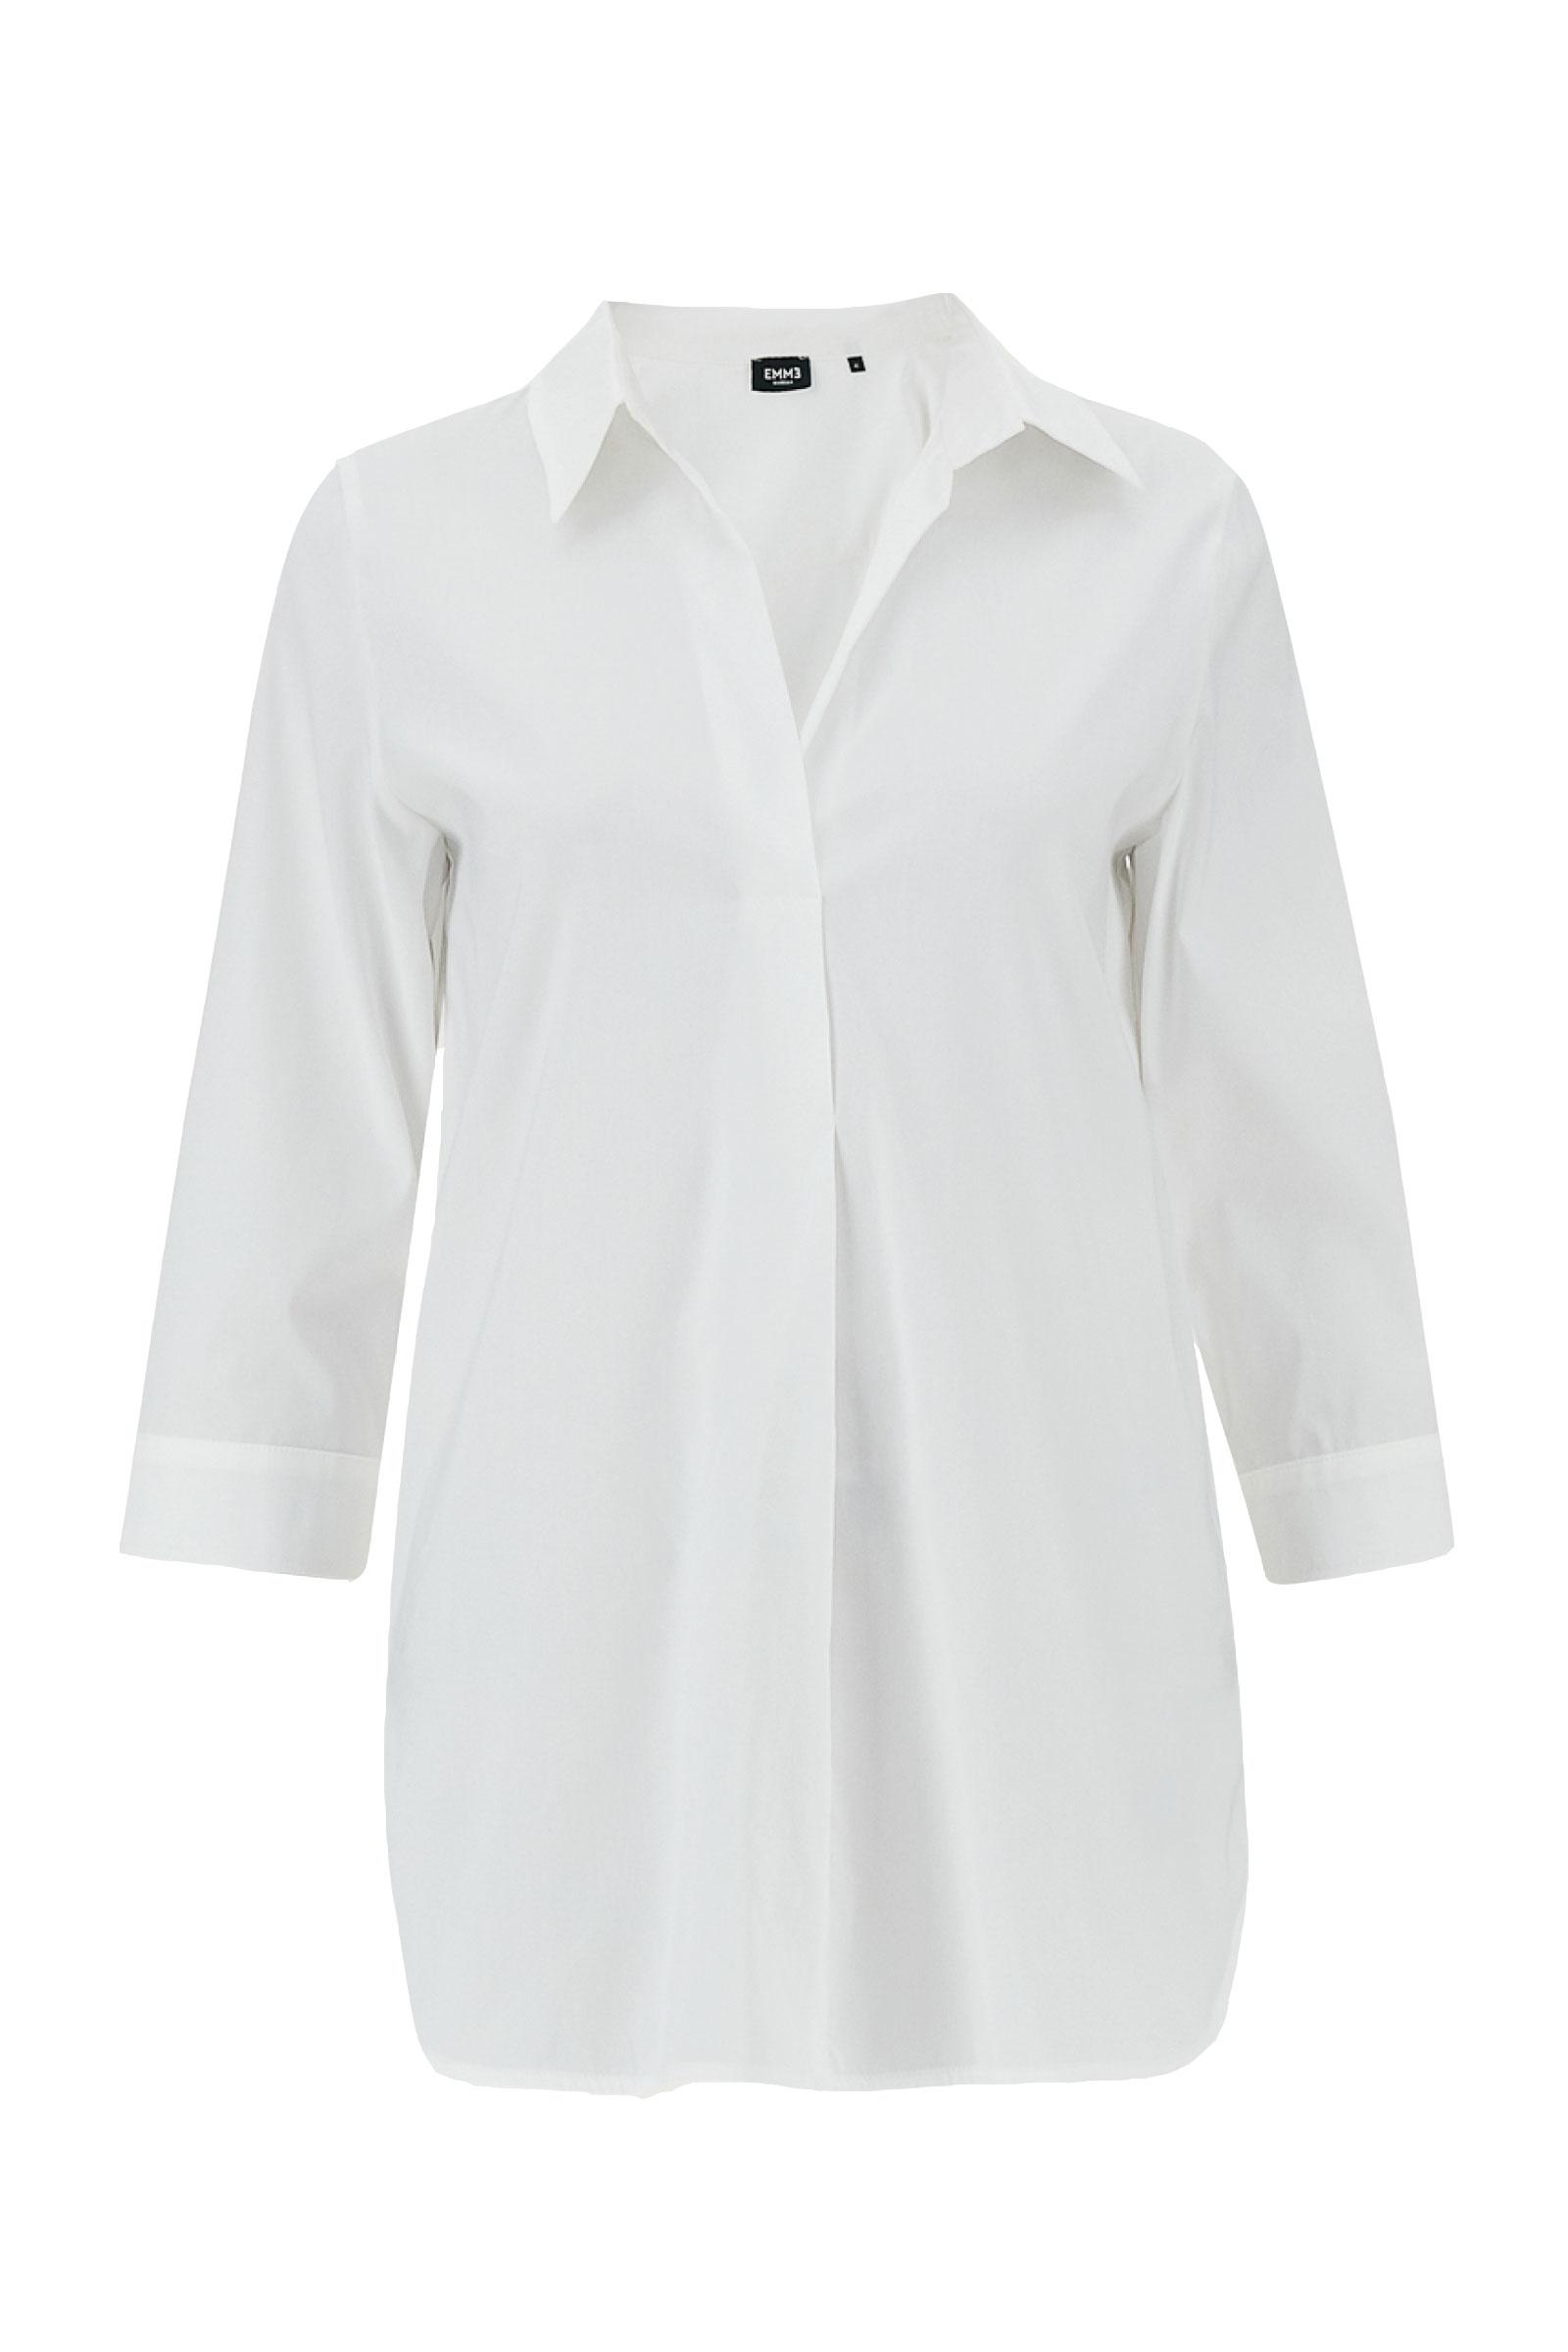 EMME MARELLA | Shirt | 51110815000001